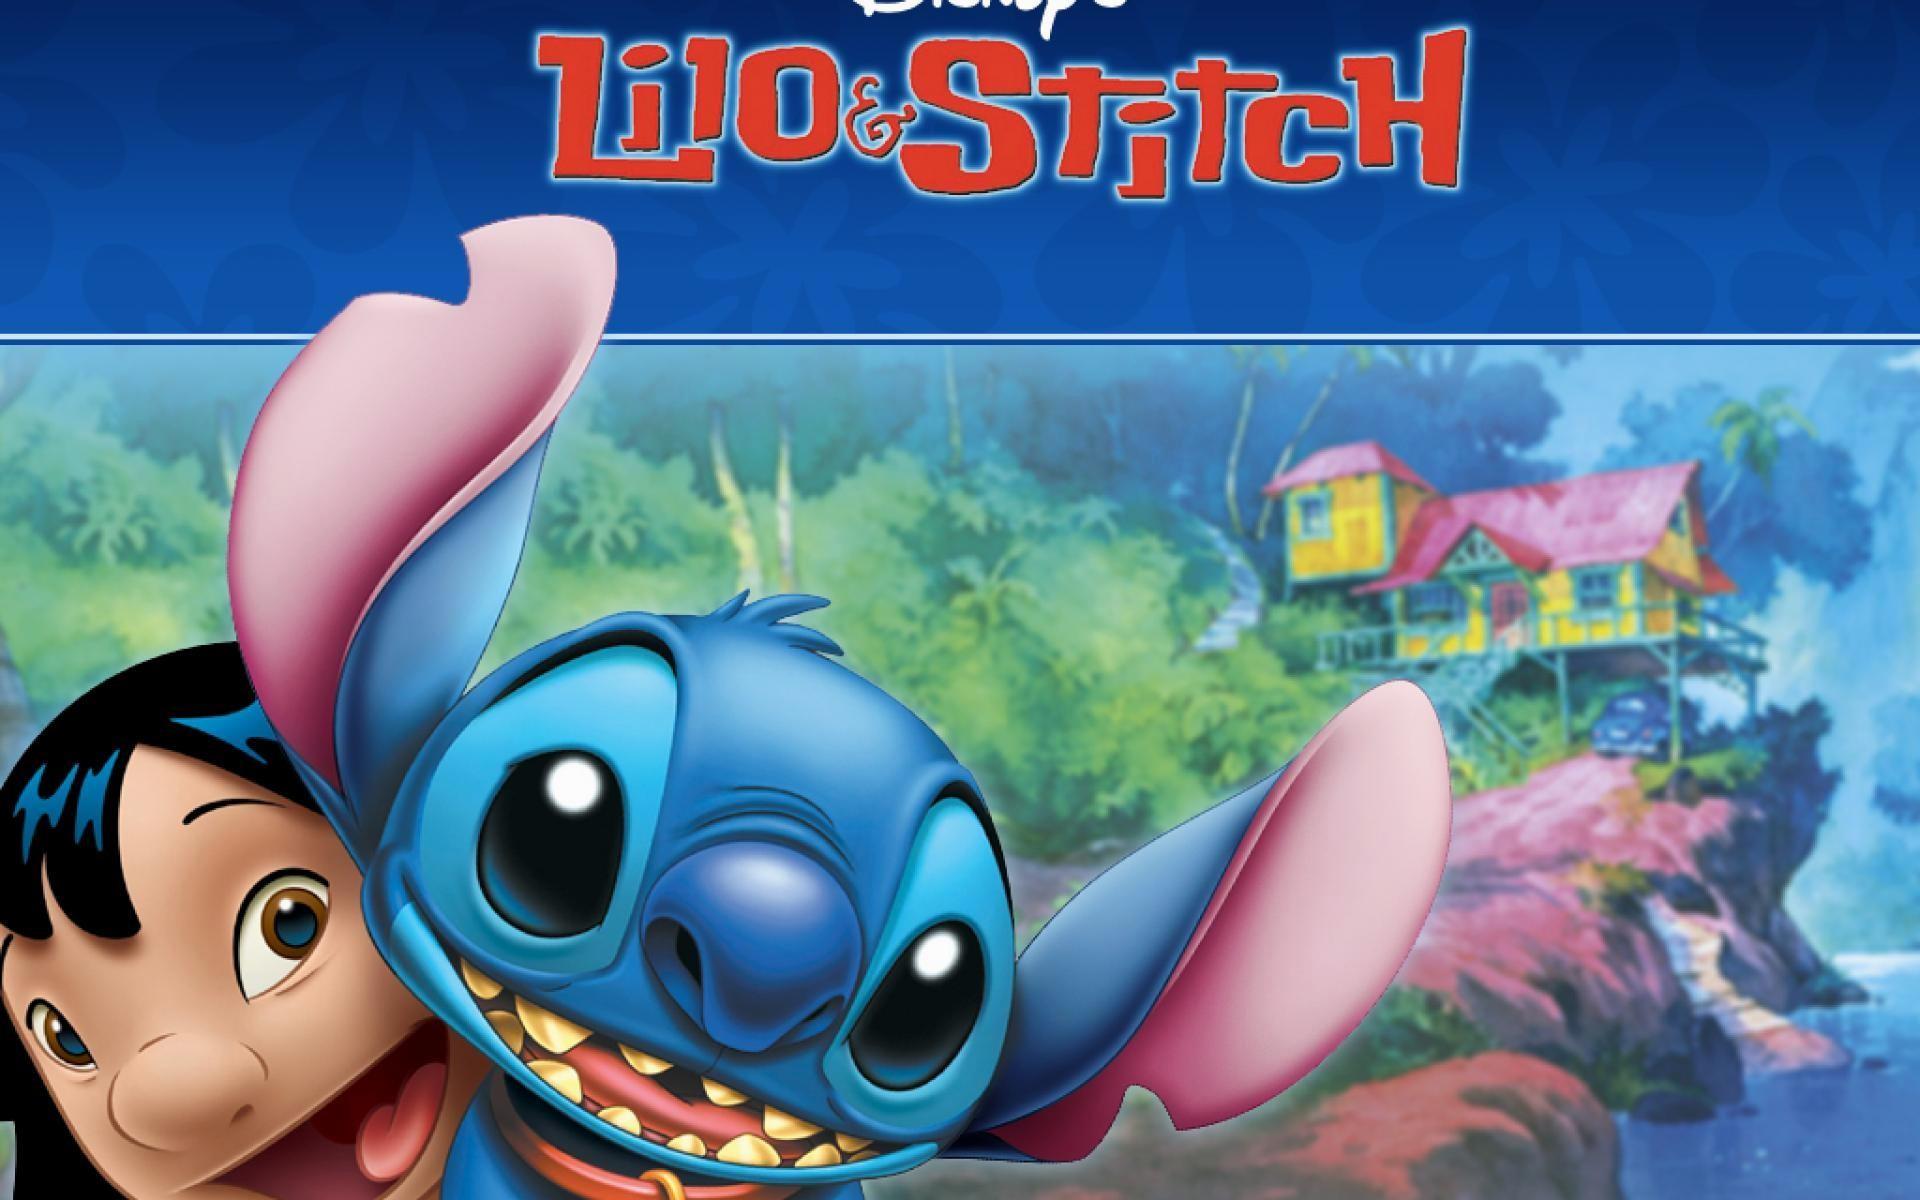 Lilo-stitch-film-movies-hd-wallpapers